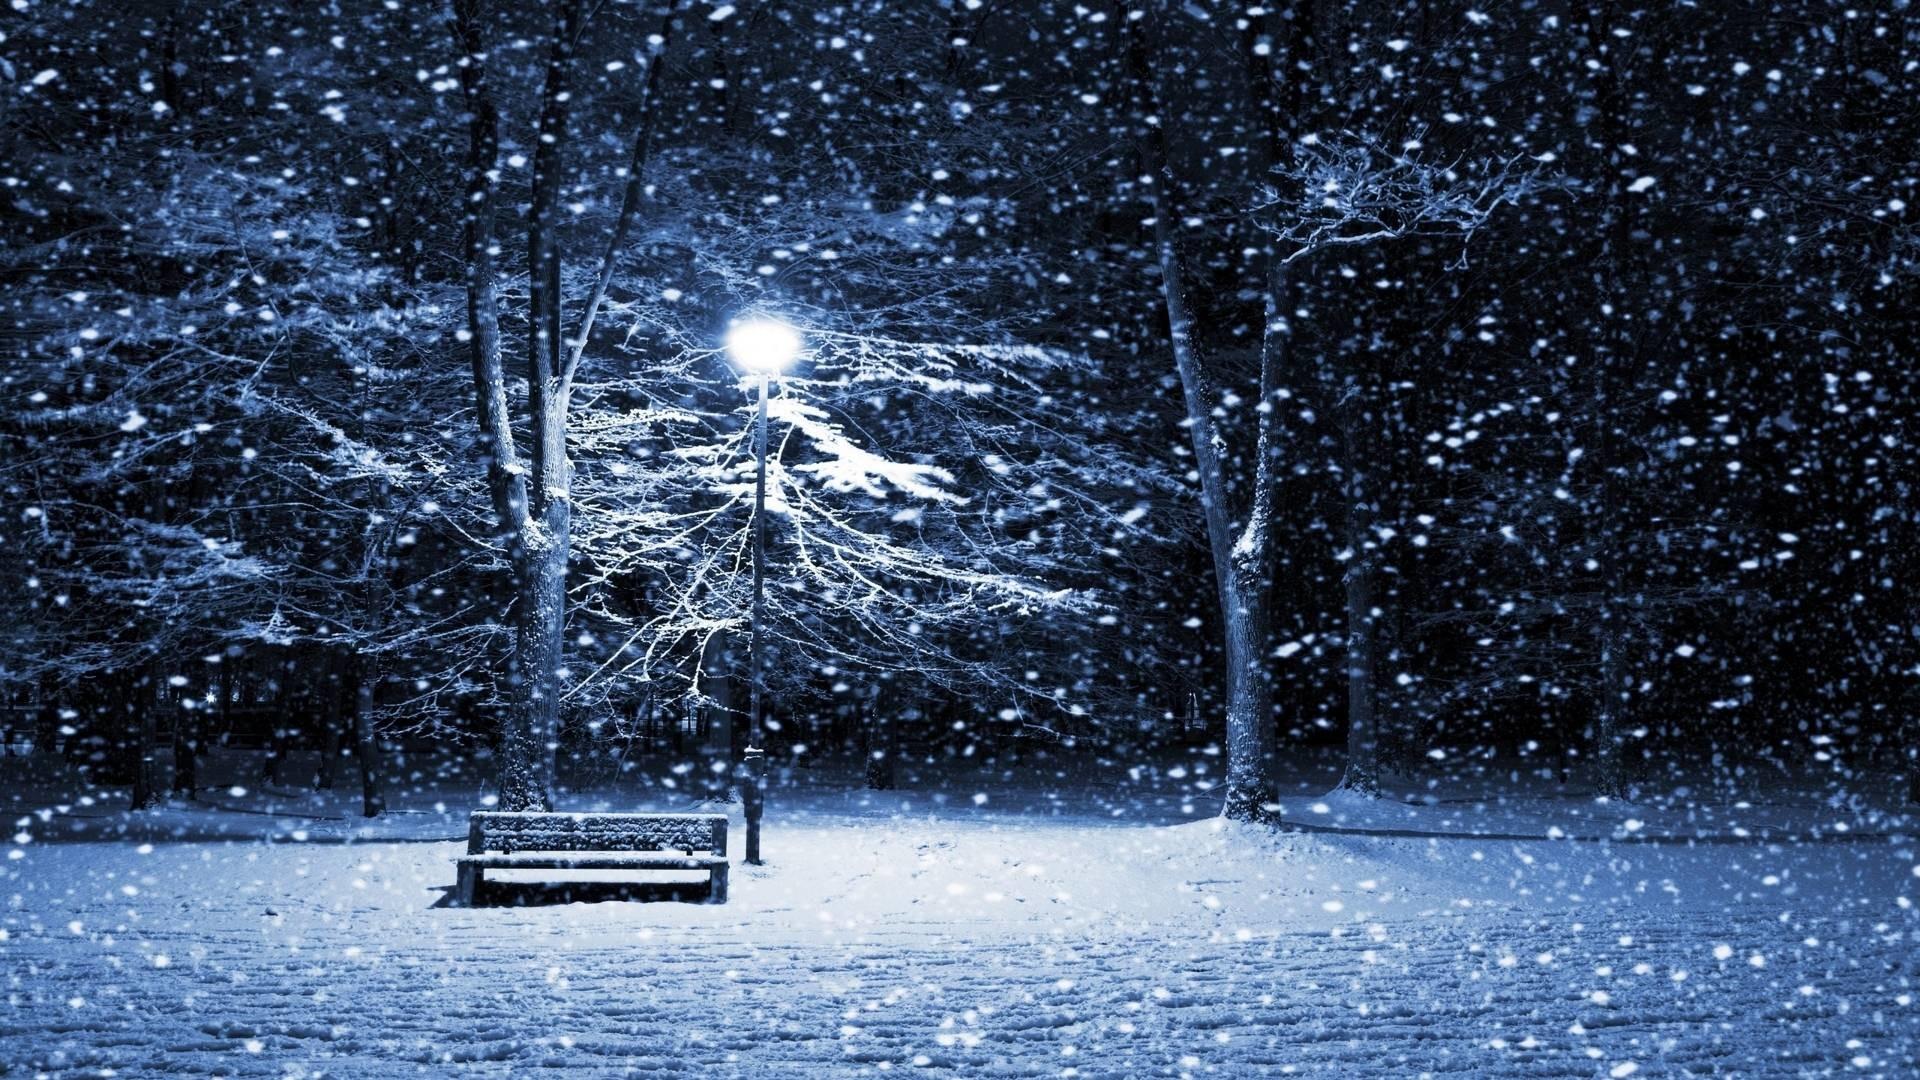 Cold Night Snowfall   Wallpaper JPEG